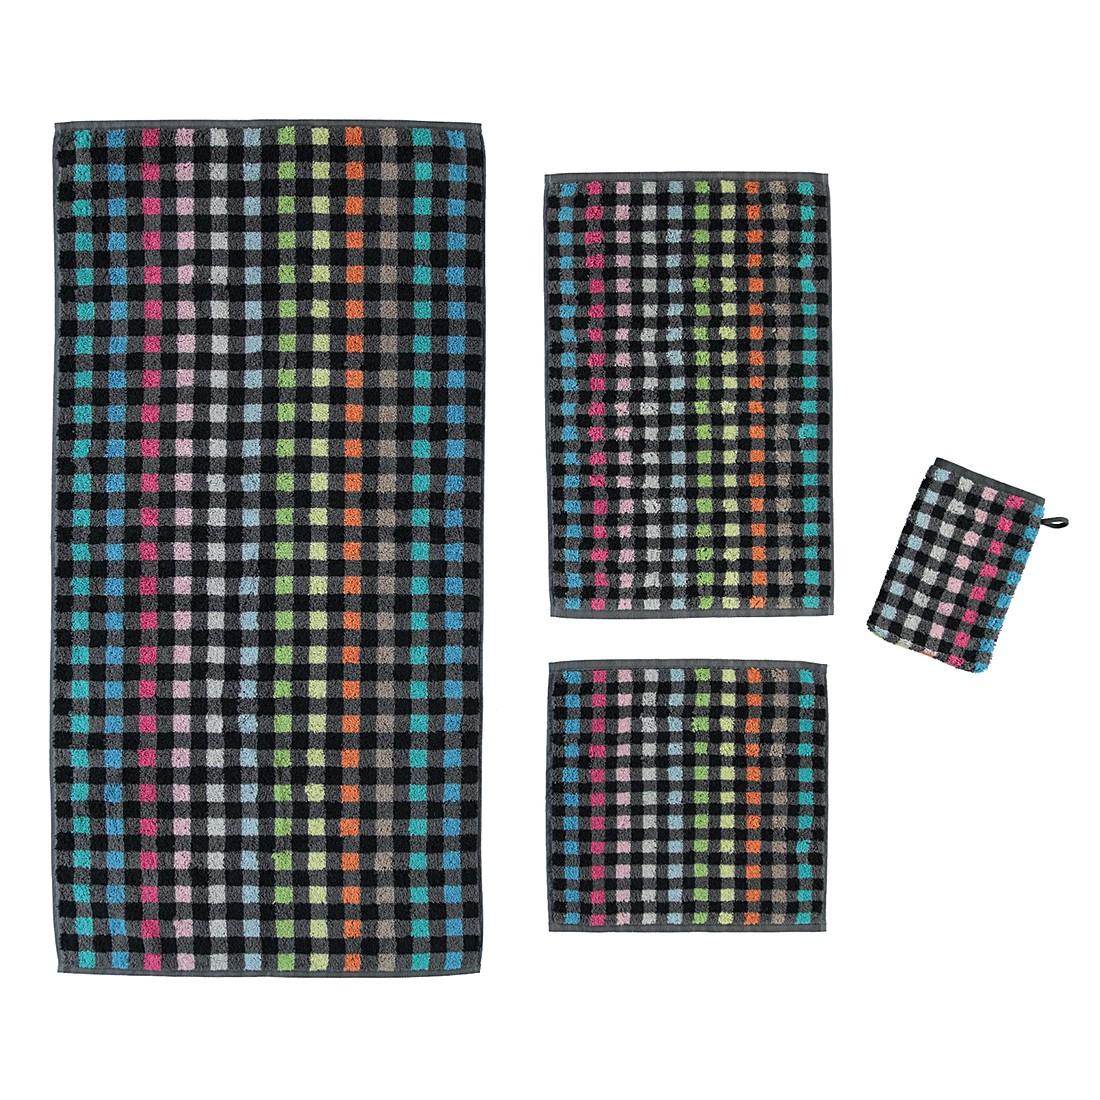 handt cher loft karo 516 baumwolle multicolor seiflappen 30x30 cm caw g nstig online kaufen. Black Bedroom Furniture Sets. Home Design Ideas